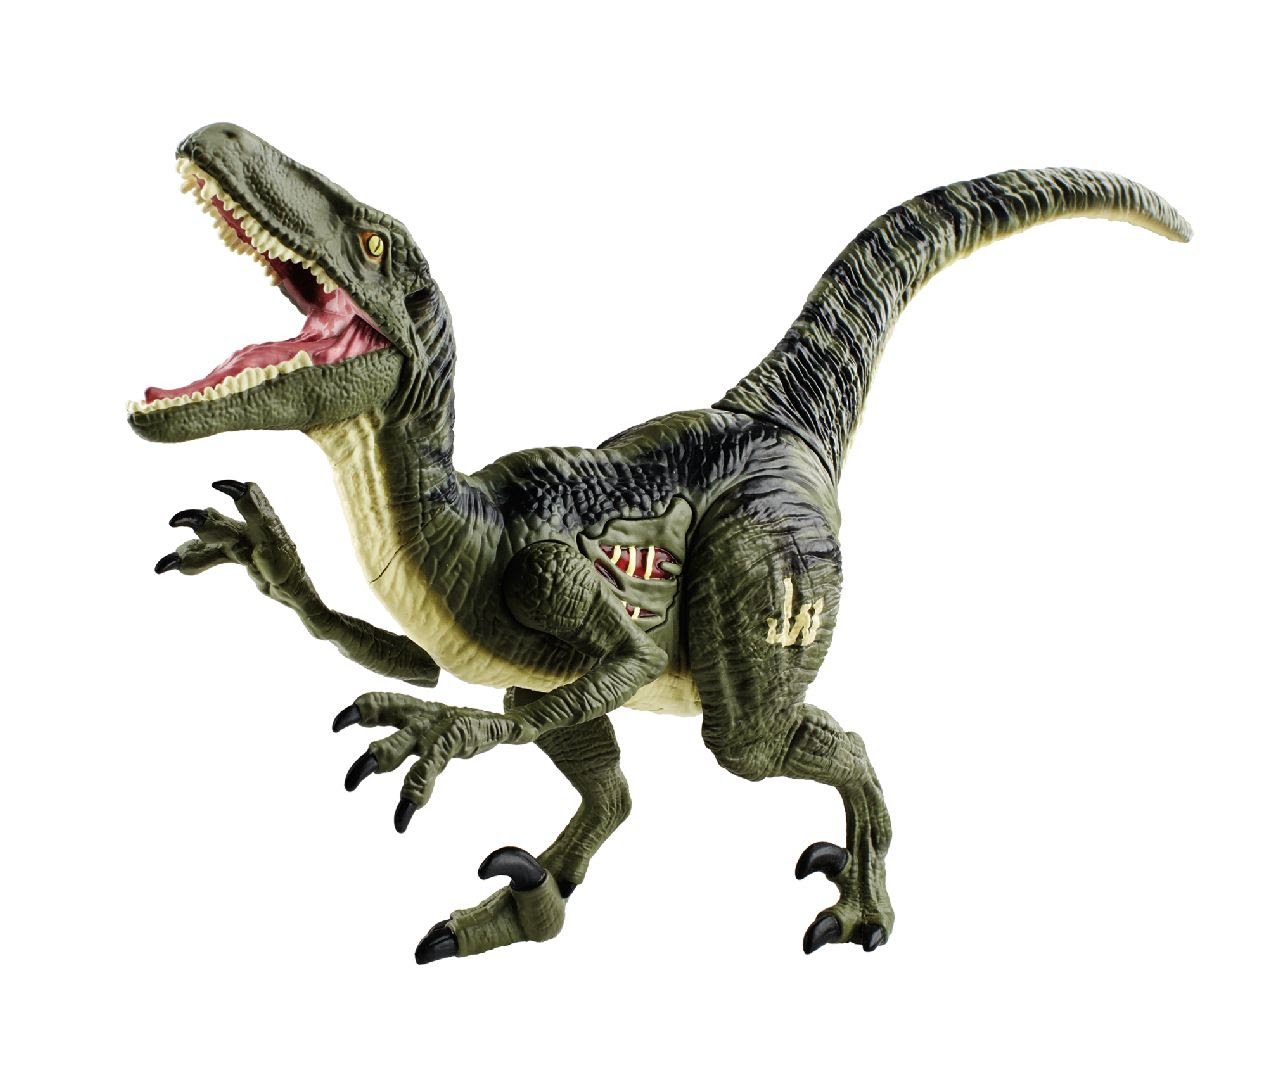 Jurassic World Hasbro Toys